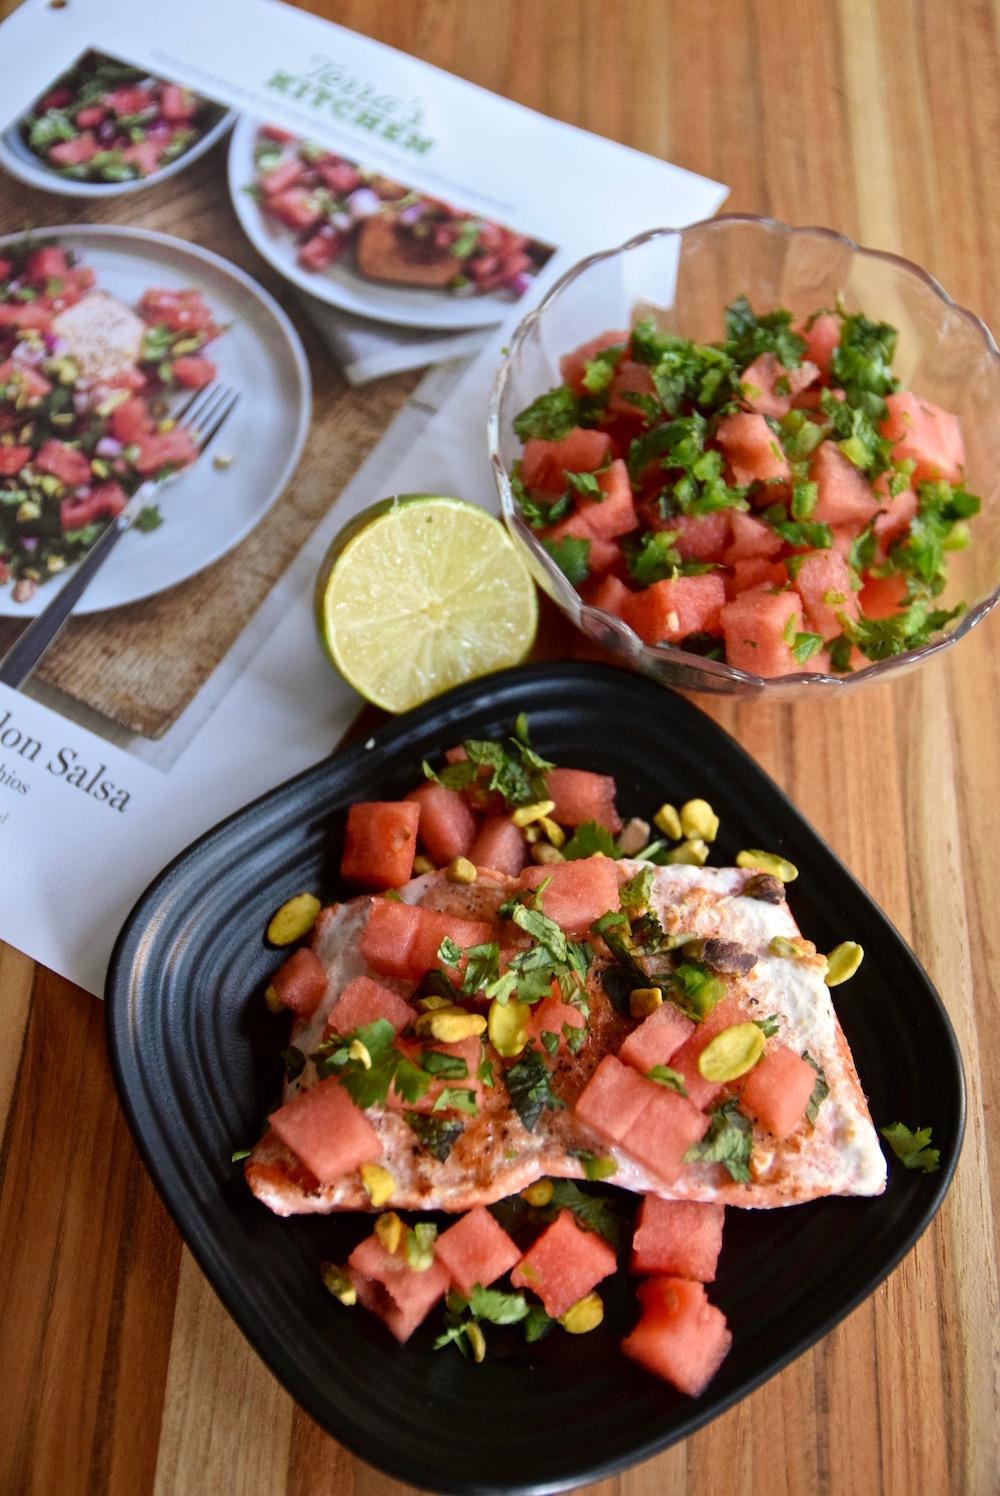 Terra's Kitchen salmon and watermelon salsa